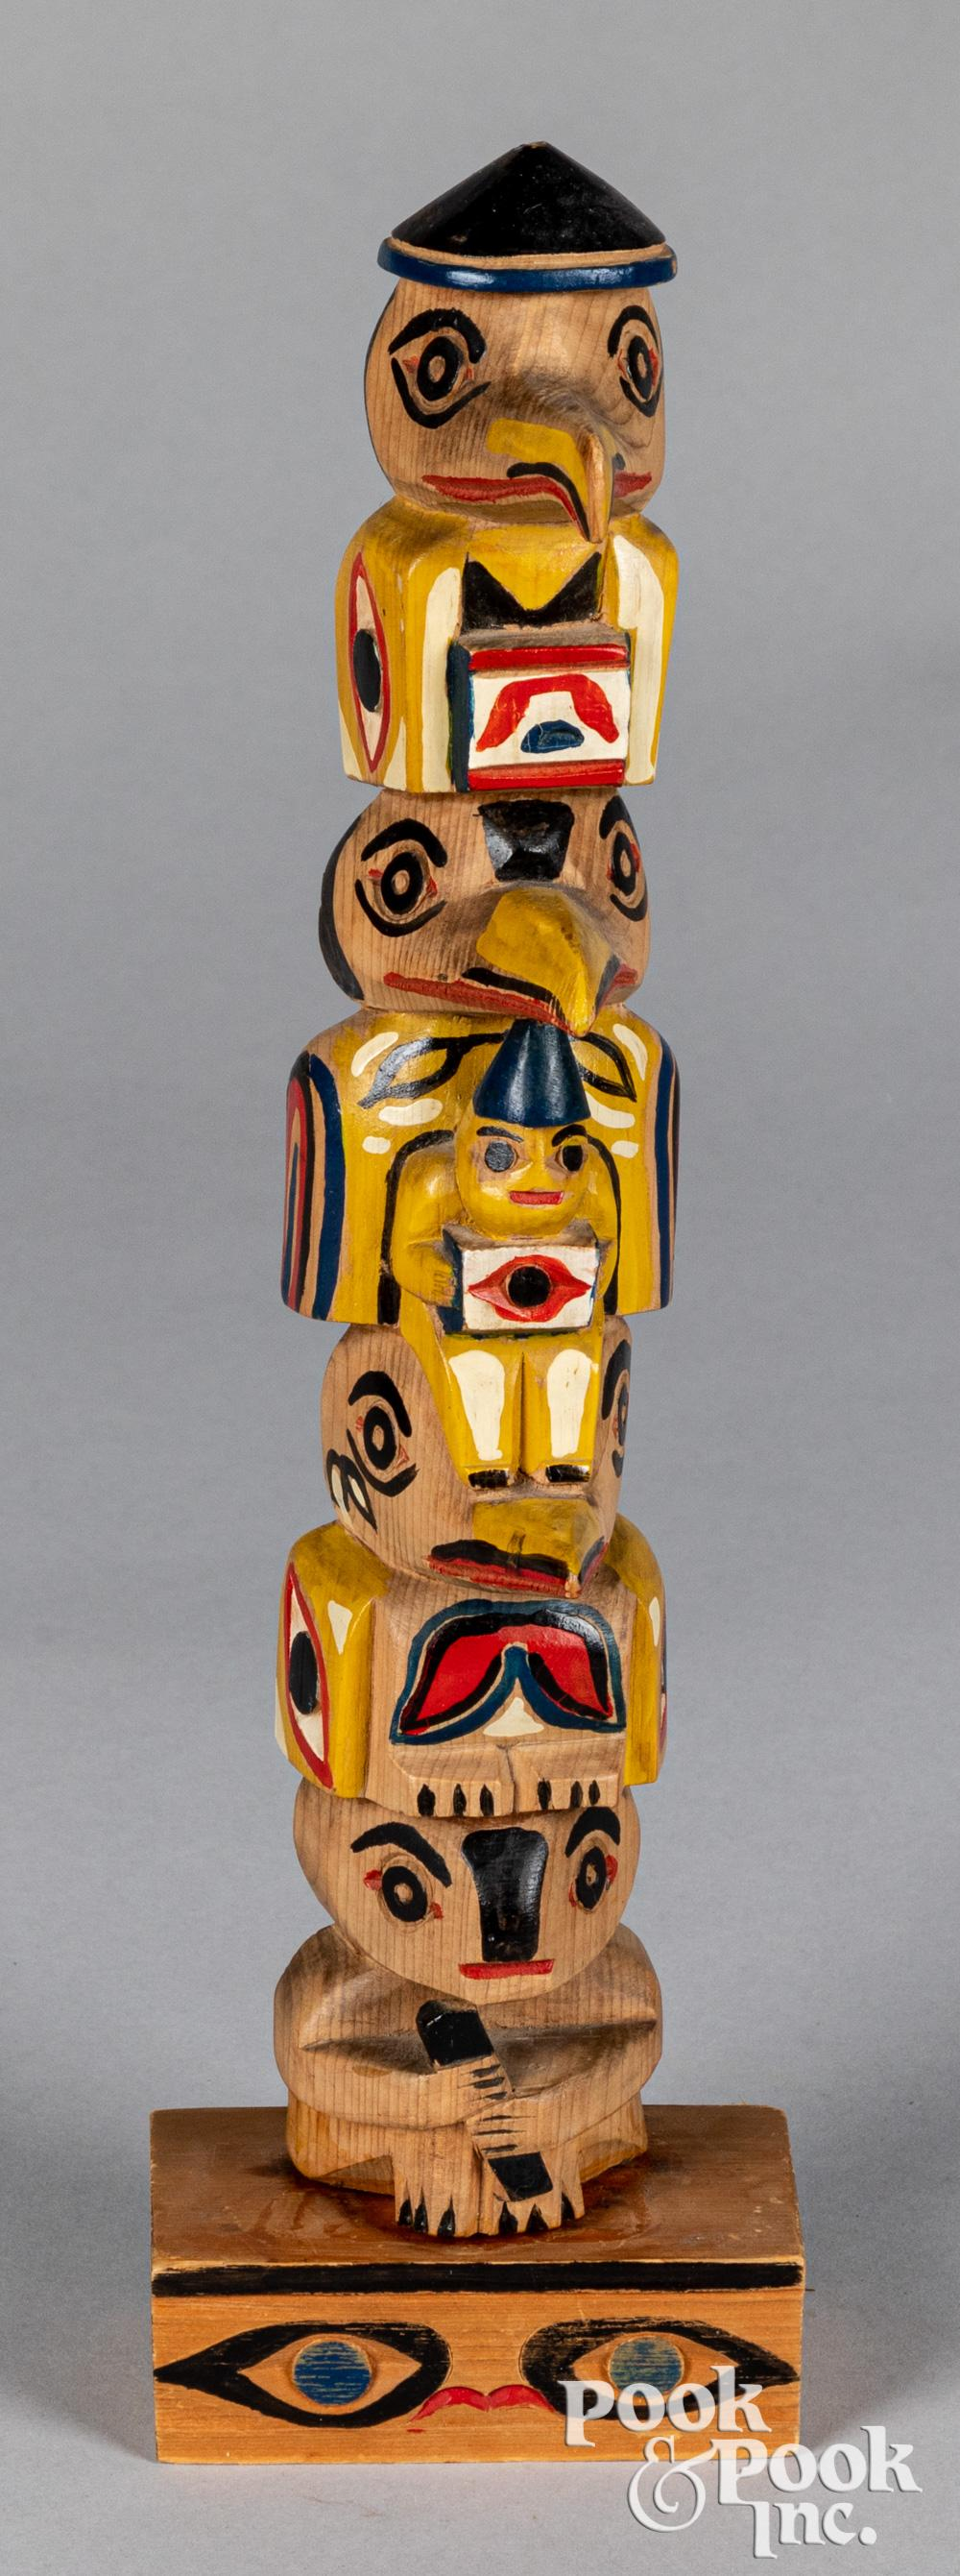 Pacific Northwest Coast Indian totem pole